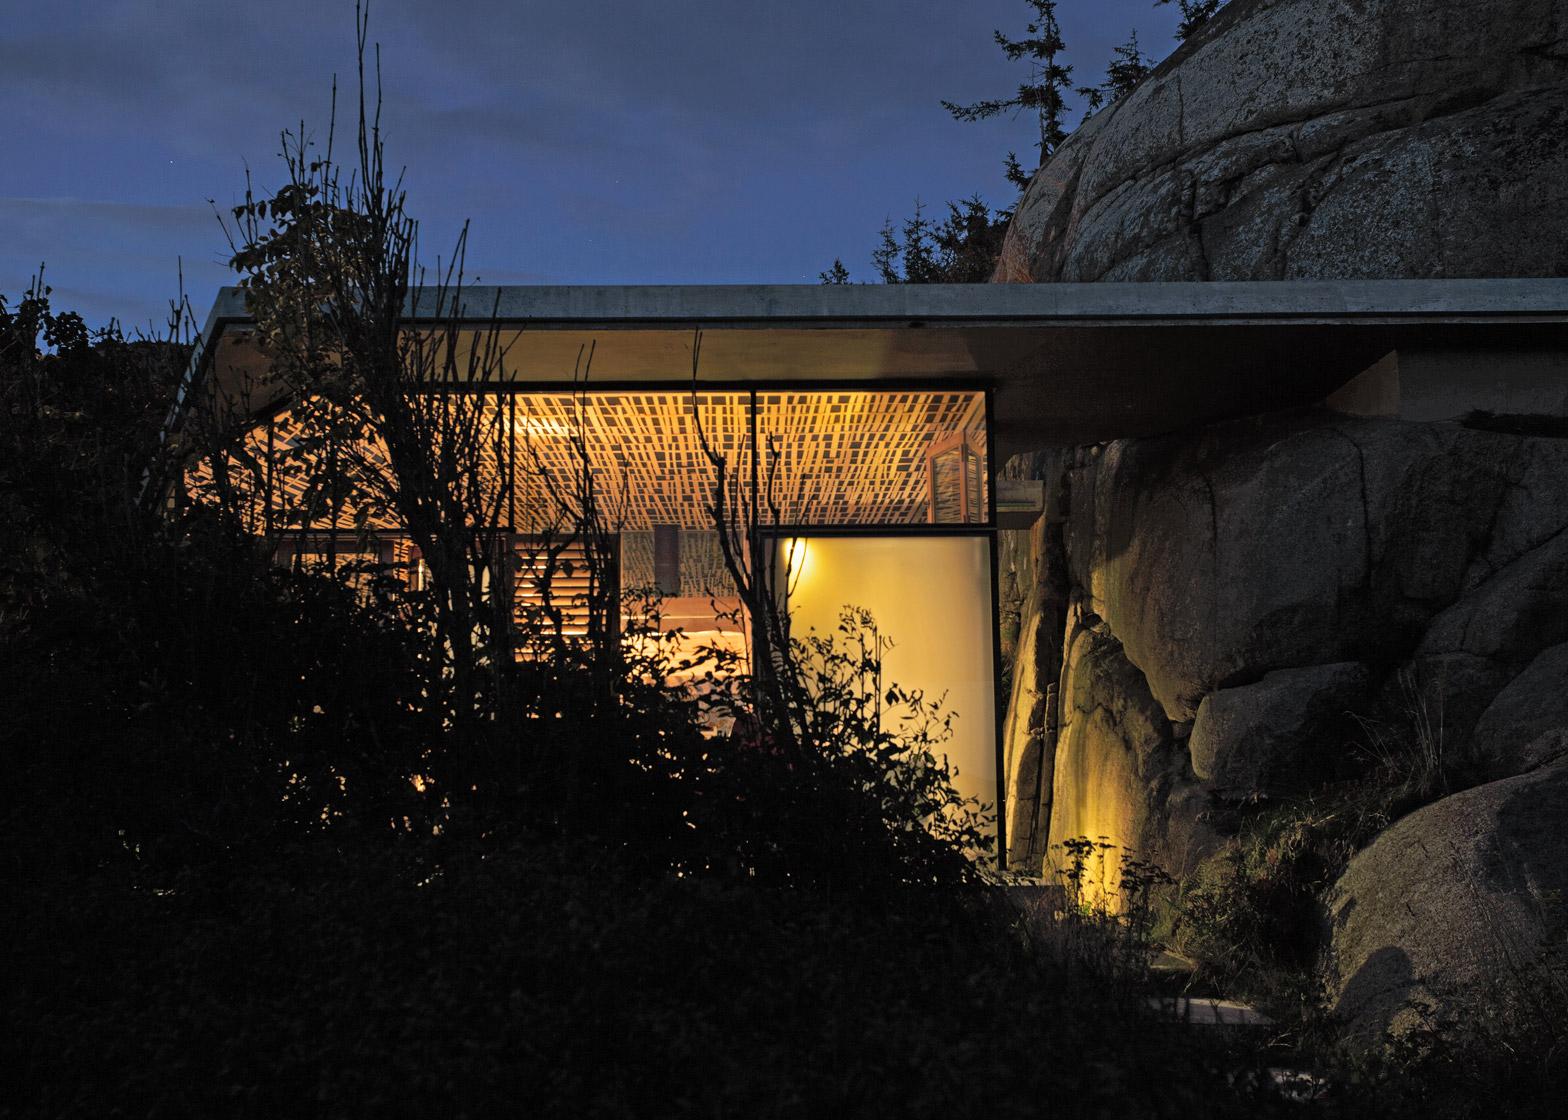 cabin-knapphullet-lund-hagem-kim-muller-photography-sandefjord-norway_dezeen_1568_1